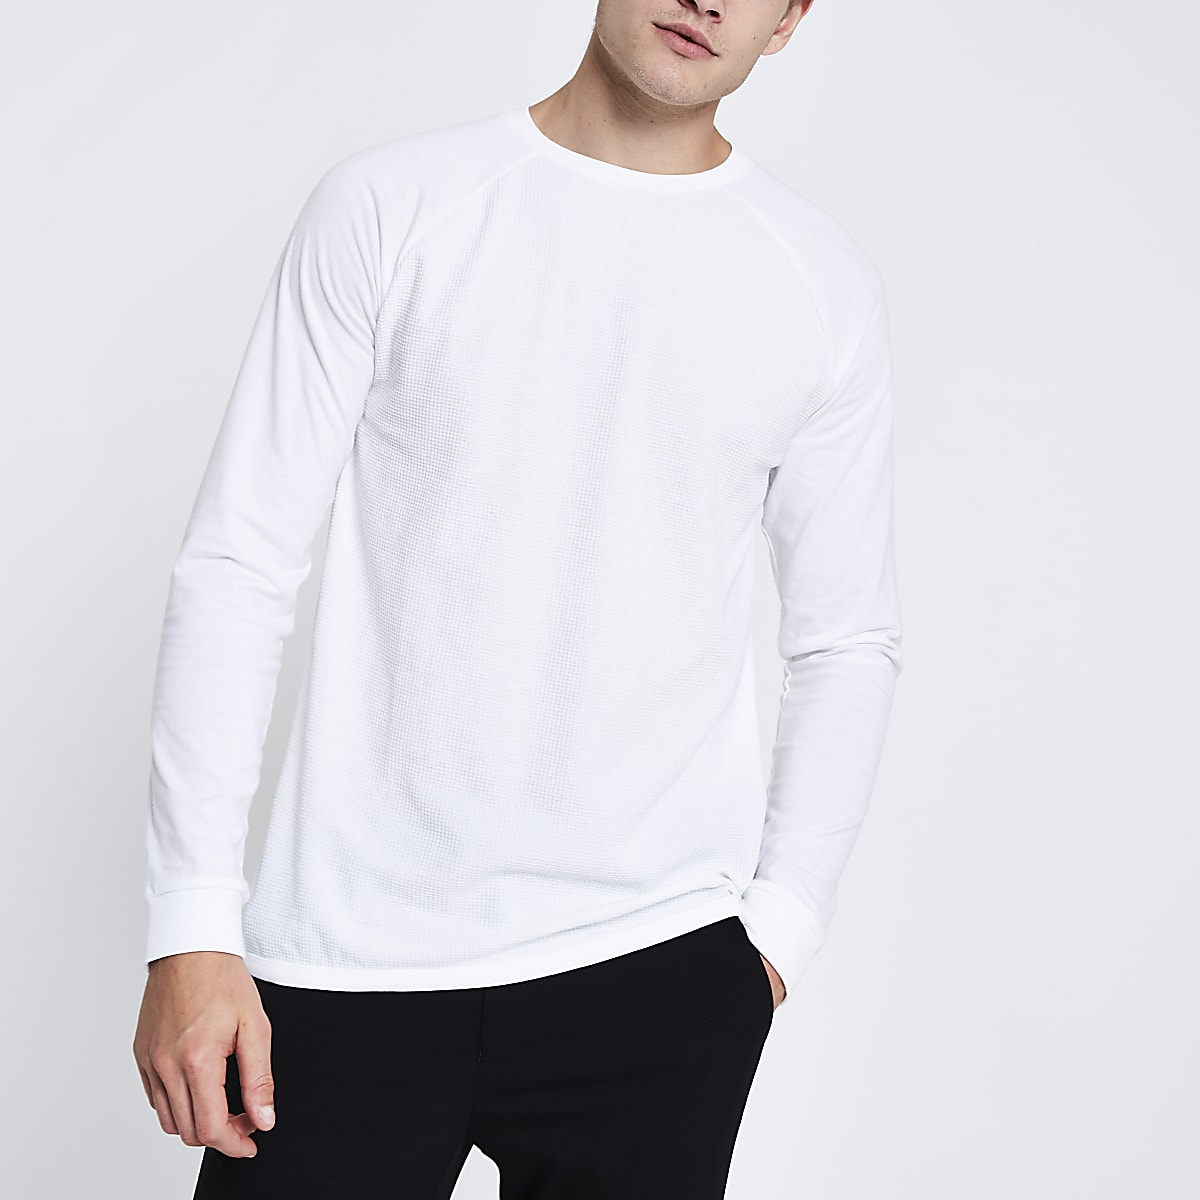 777d8016a White waffle long sleeve raglan T-shirt - Long Sleeve T-Shirts - T-Shirts    Vests - men